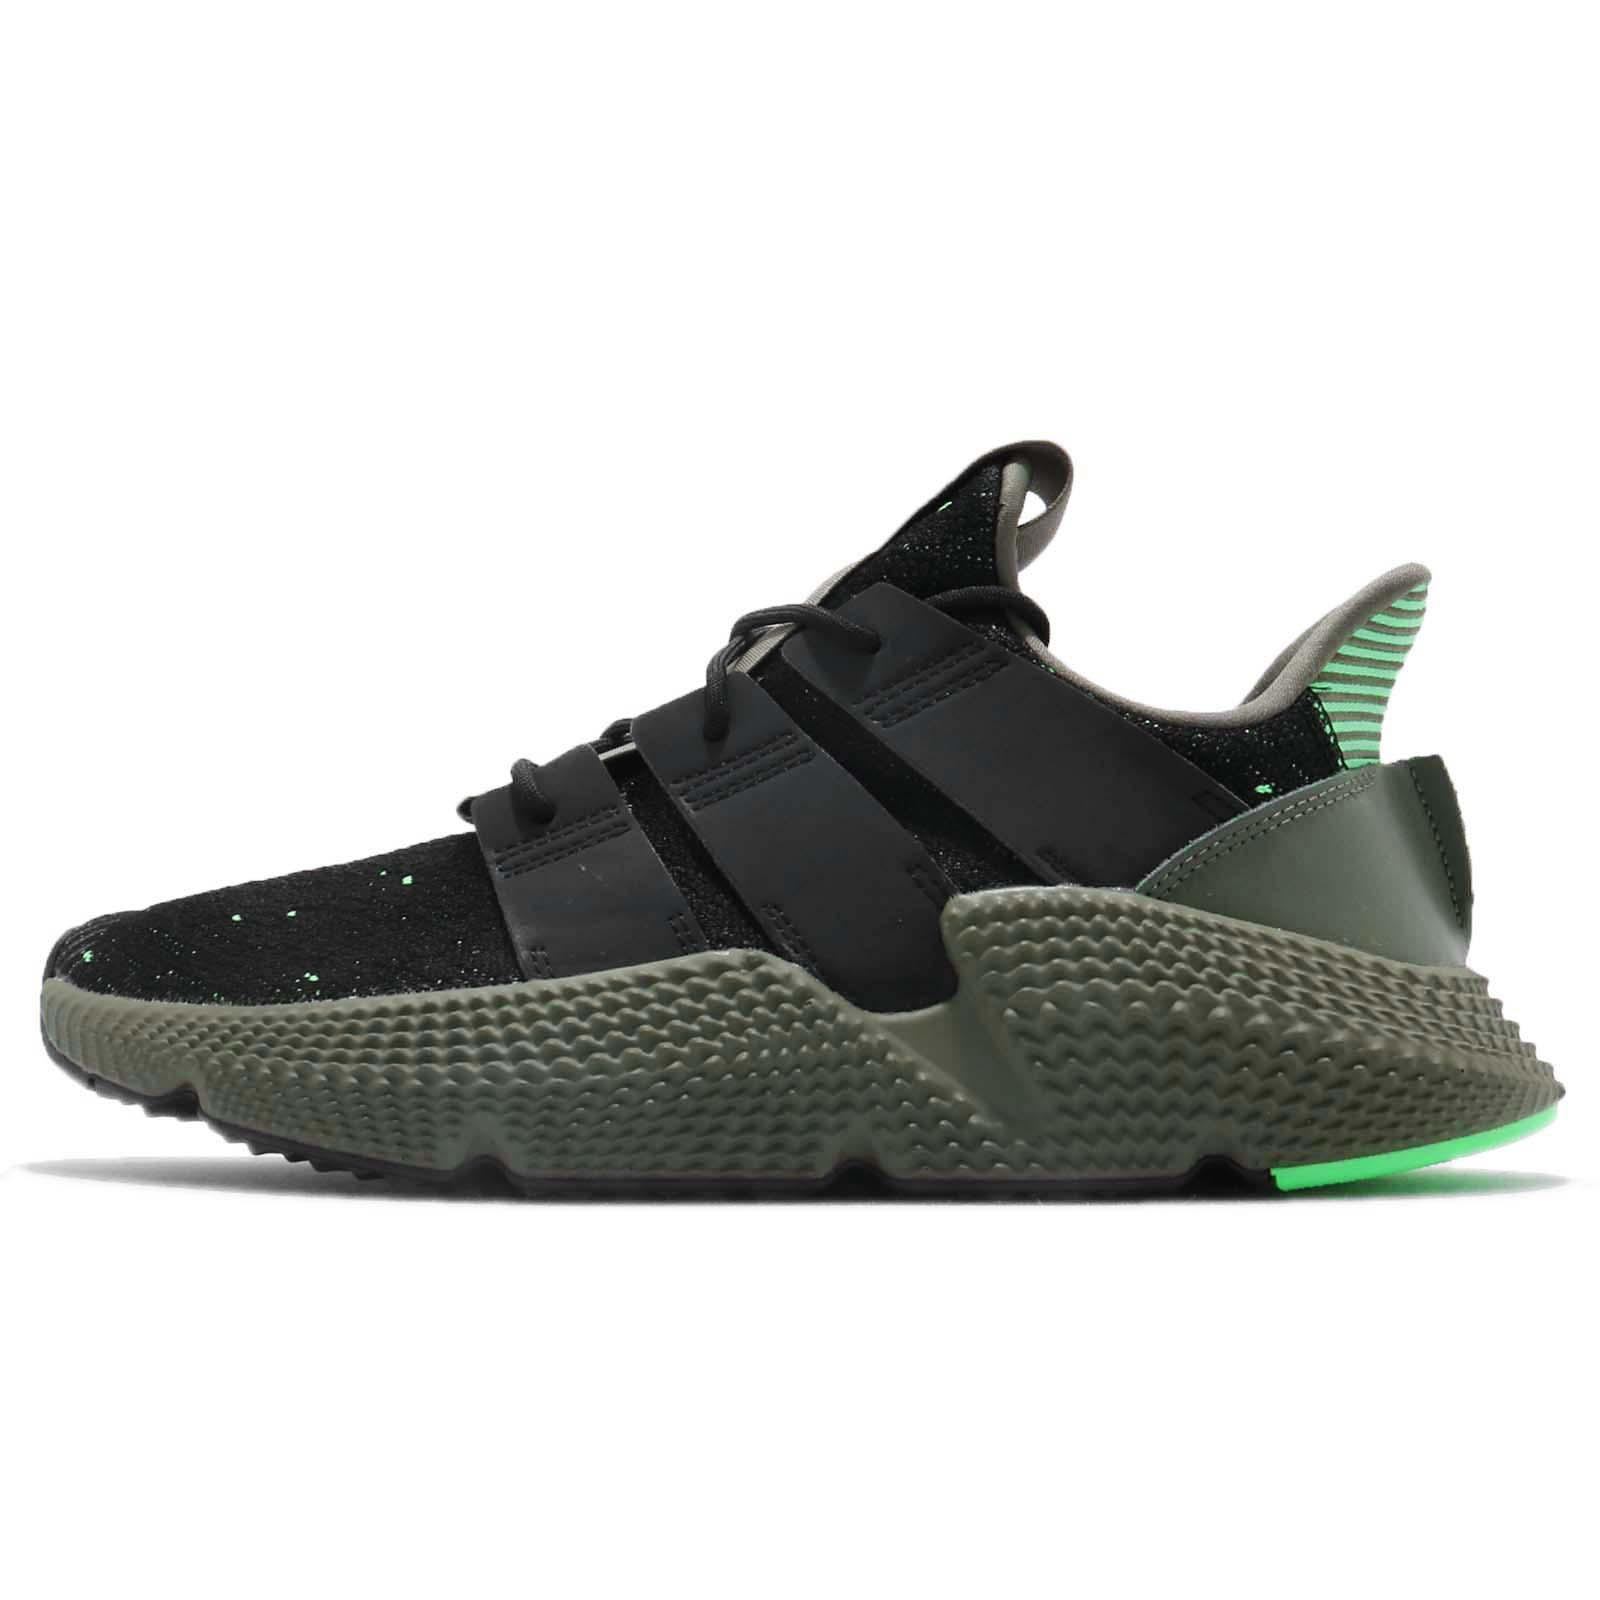 b662b8cc3cef08 adidas Originals Prophere Black Shock Lime Men Running Shoes Sneakers B37467